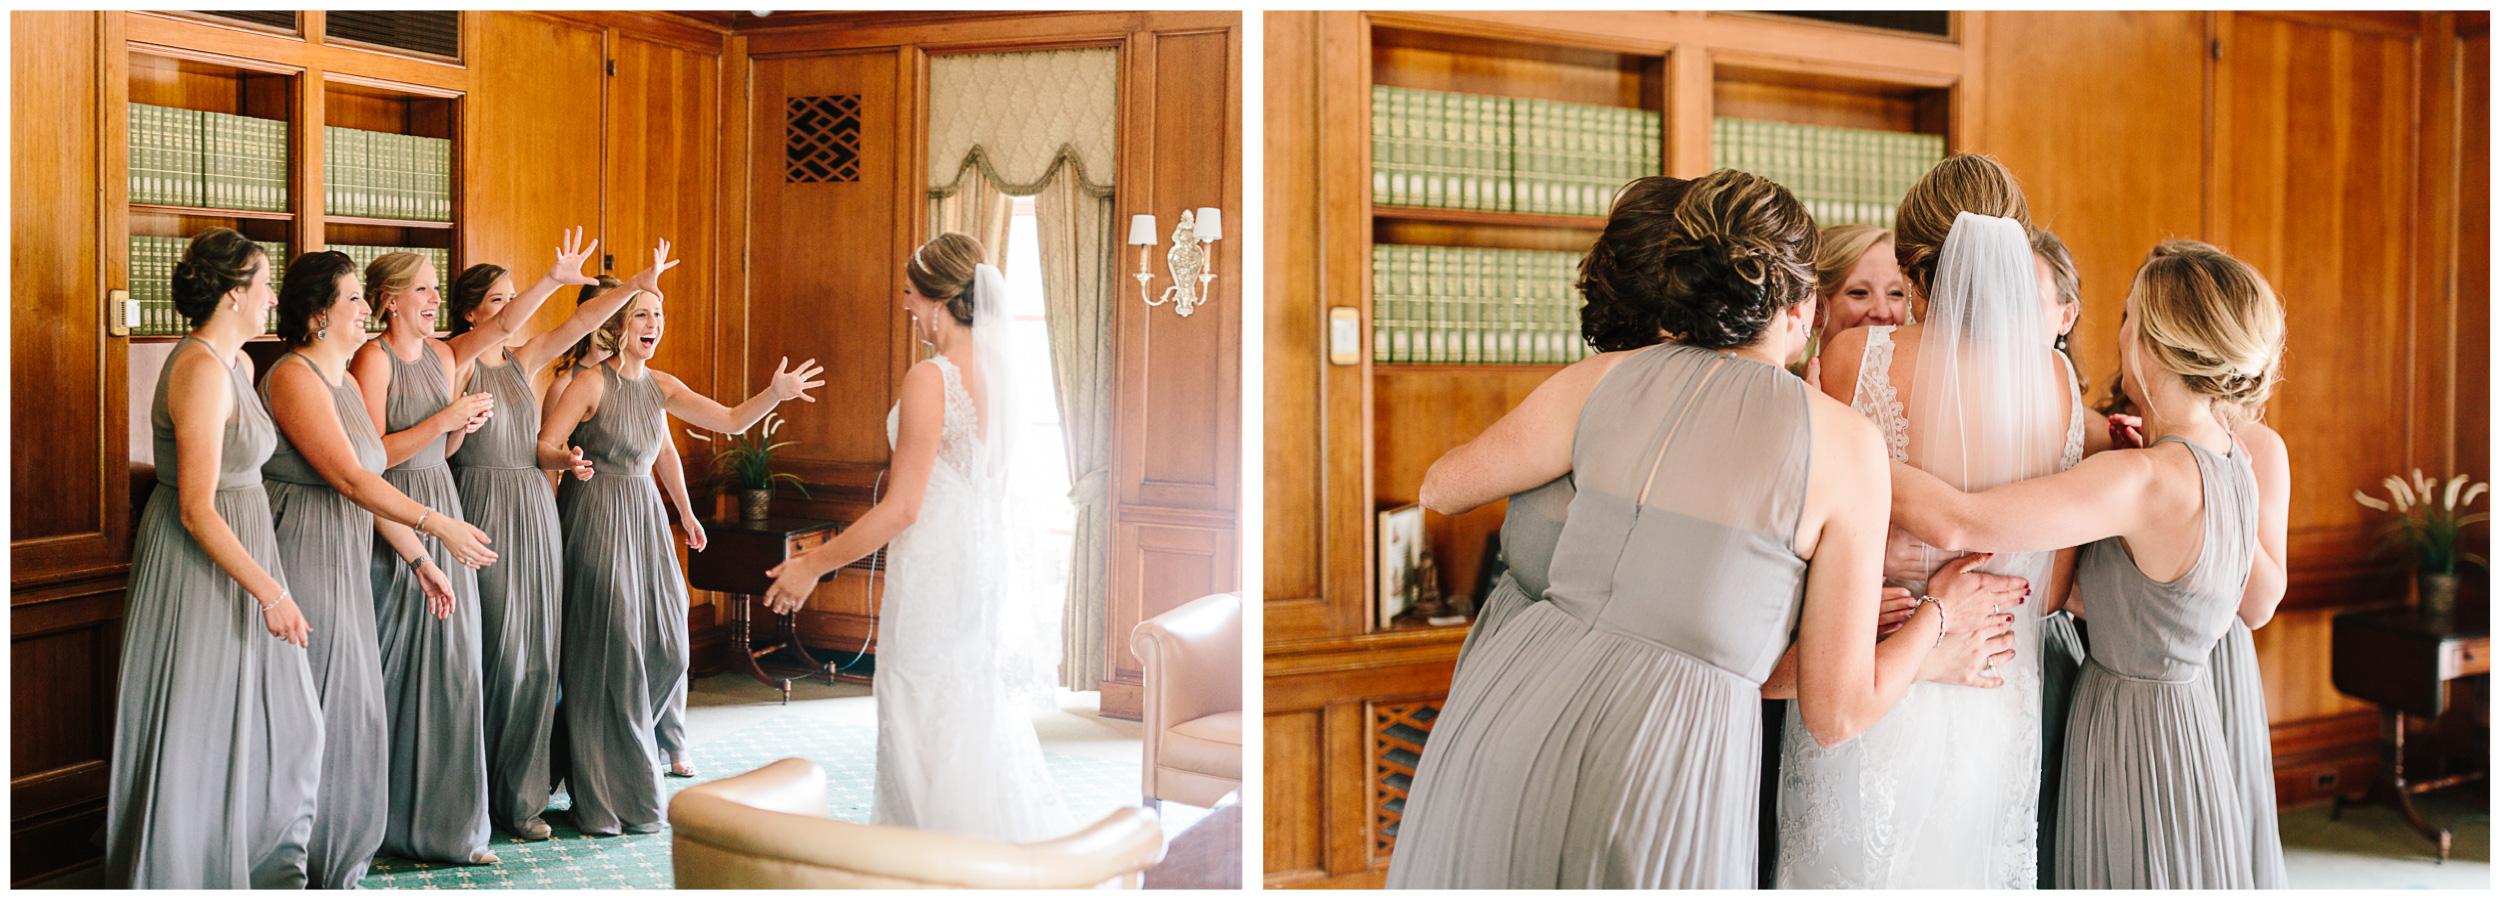 ann_arbor_michigan_wedding_17.jpg